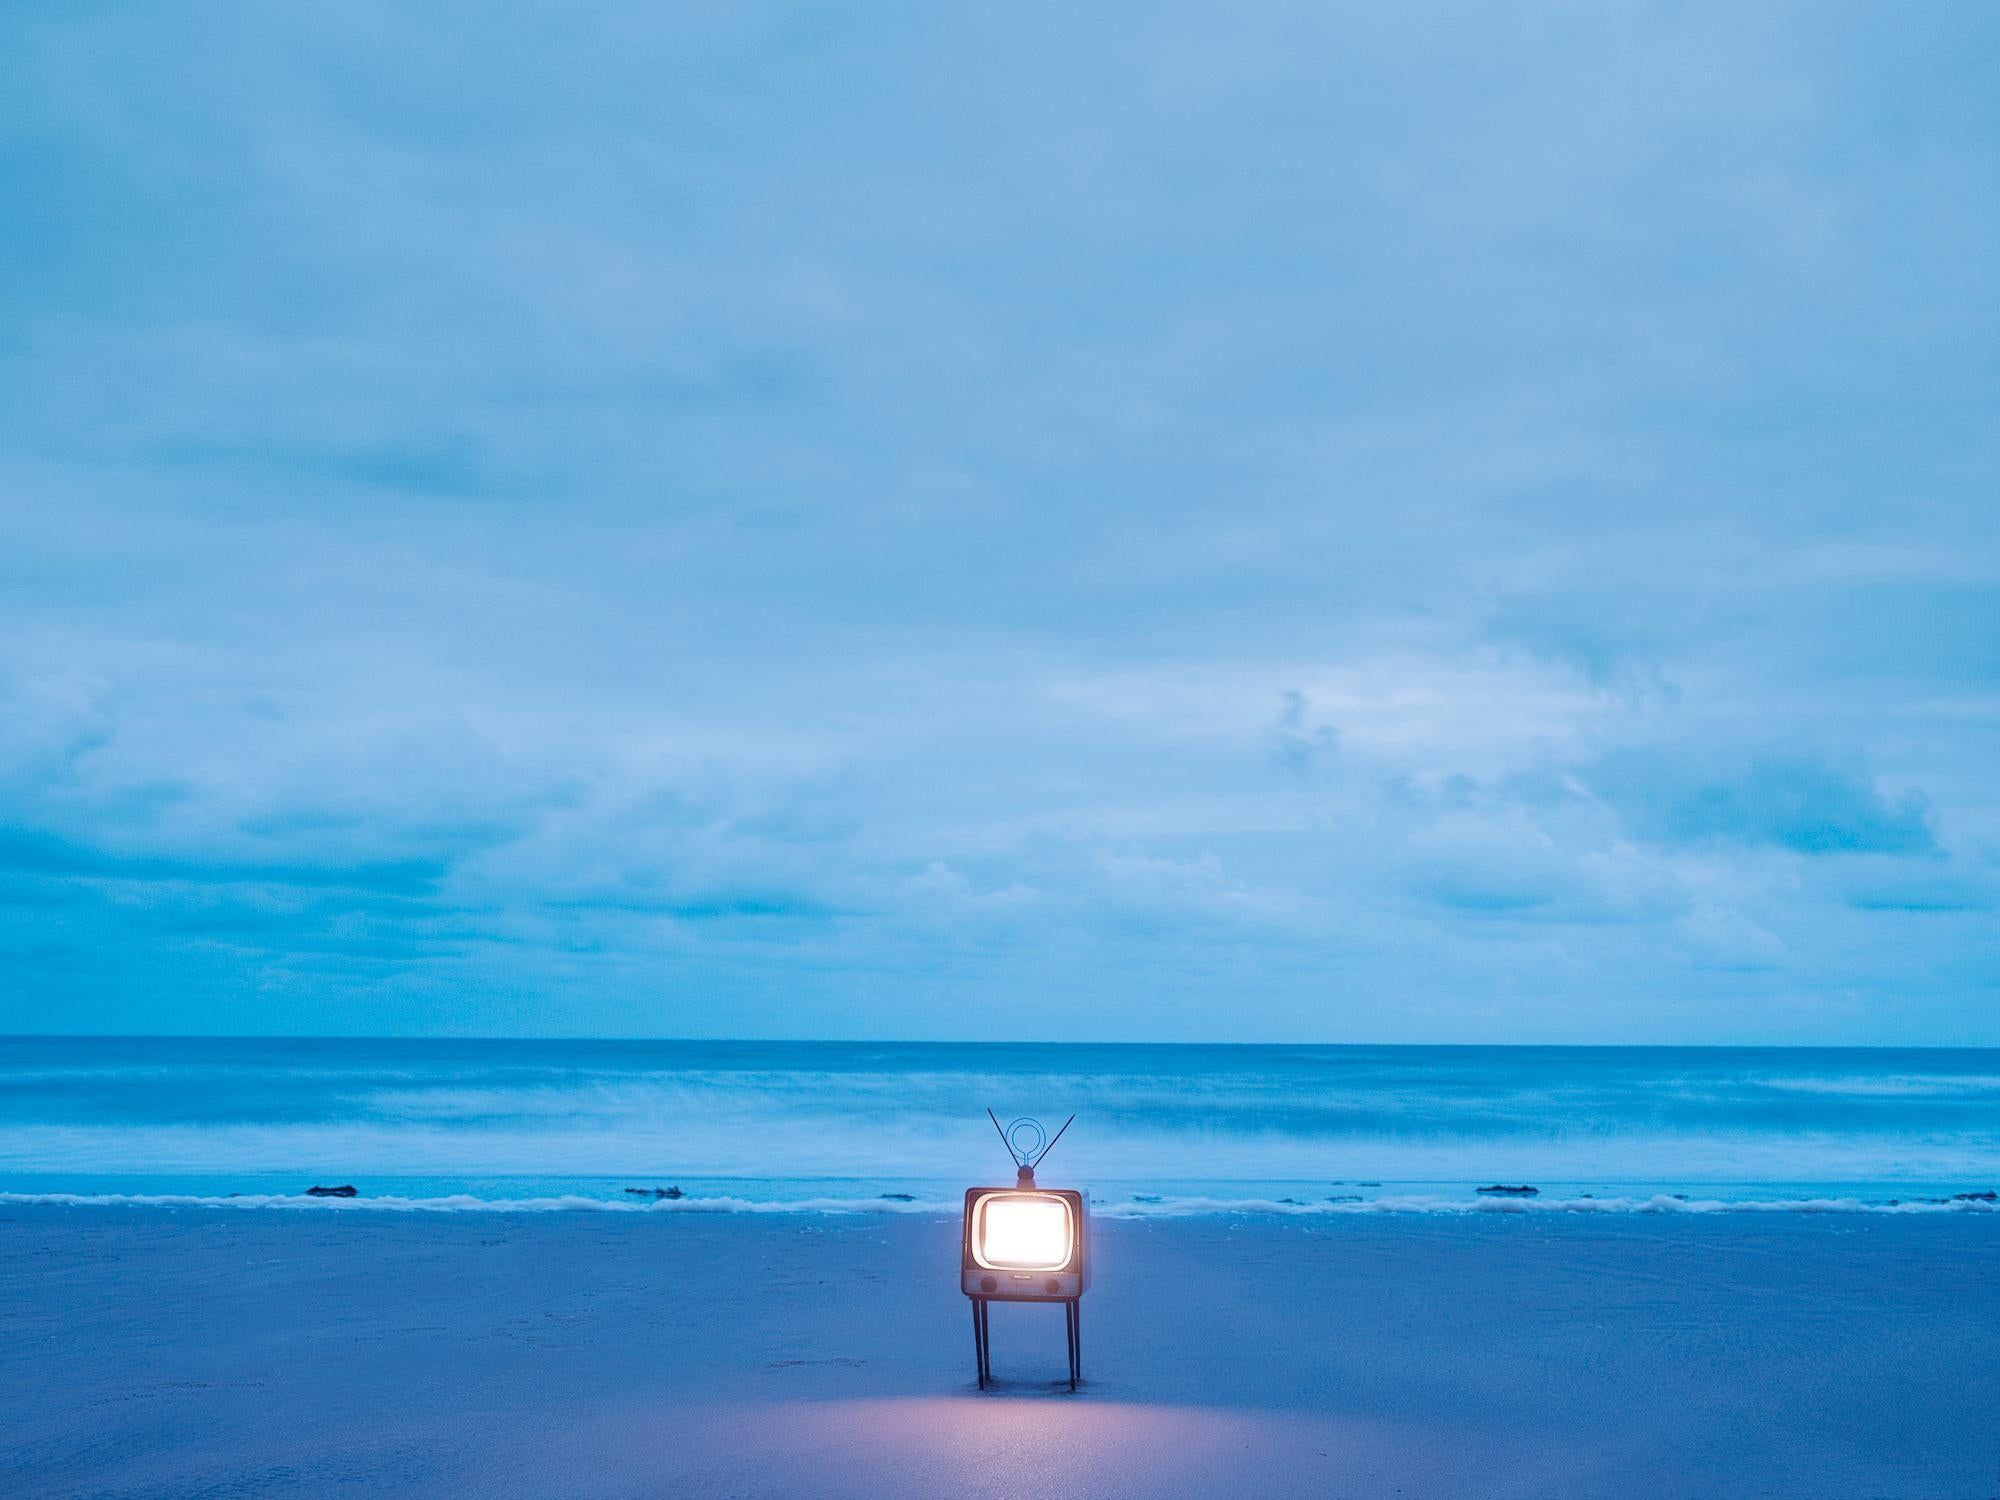 TV 2 - Samuel Hicks, Ocean, Sunset, Sea, Nature, Environment, Landscape